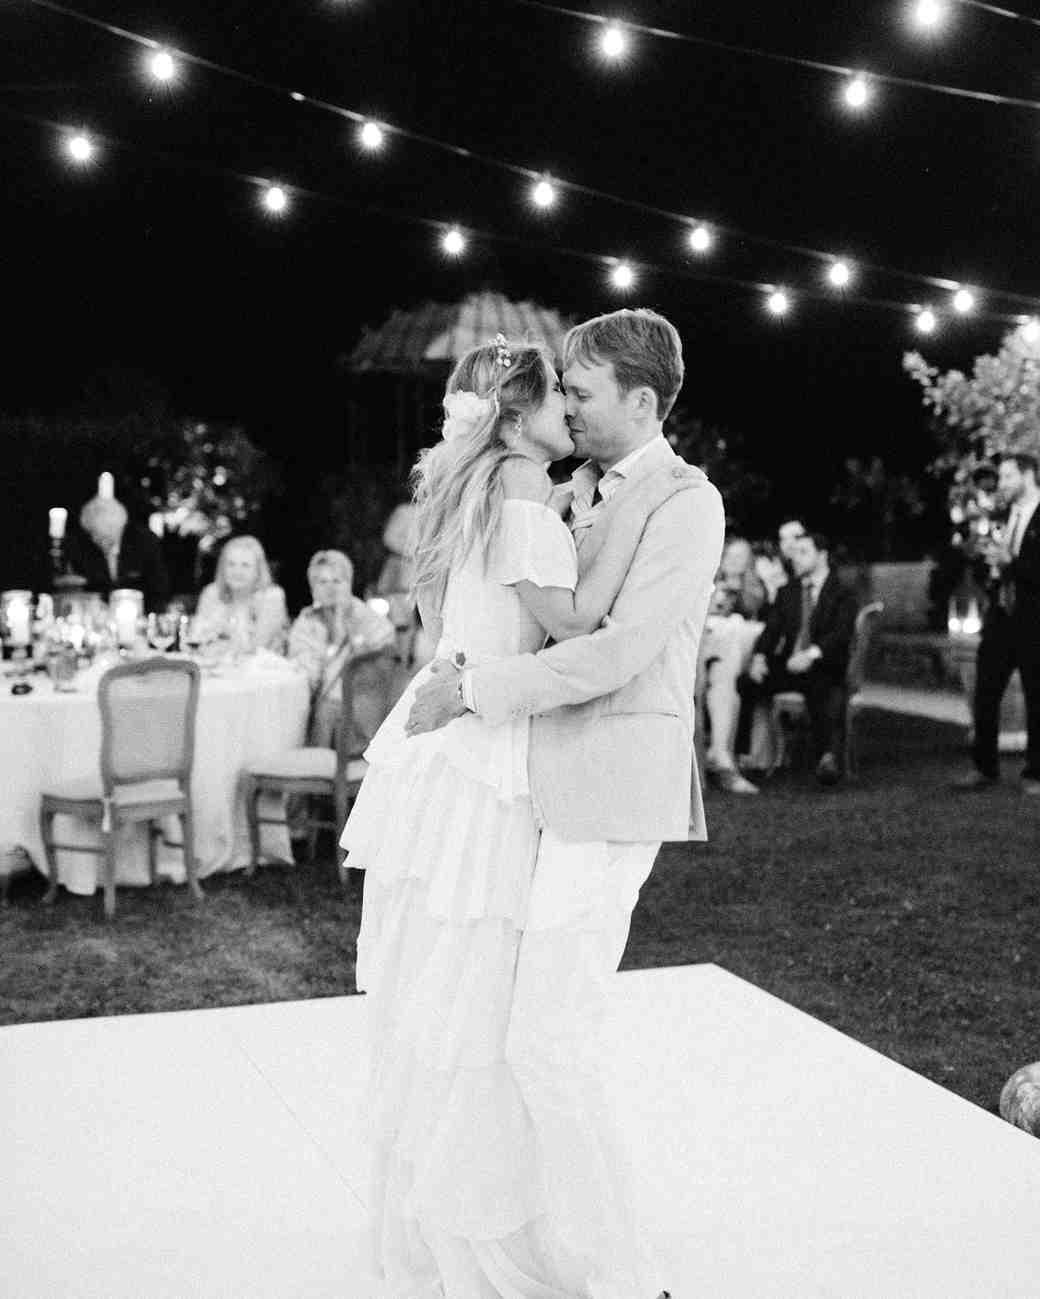 alexis zach wedding italy first dance black white